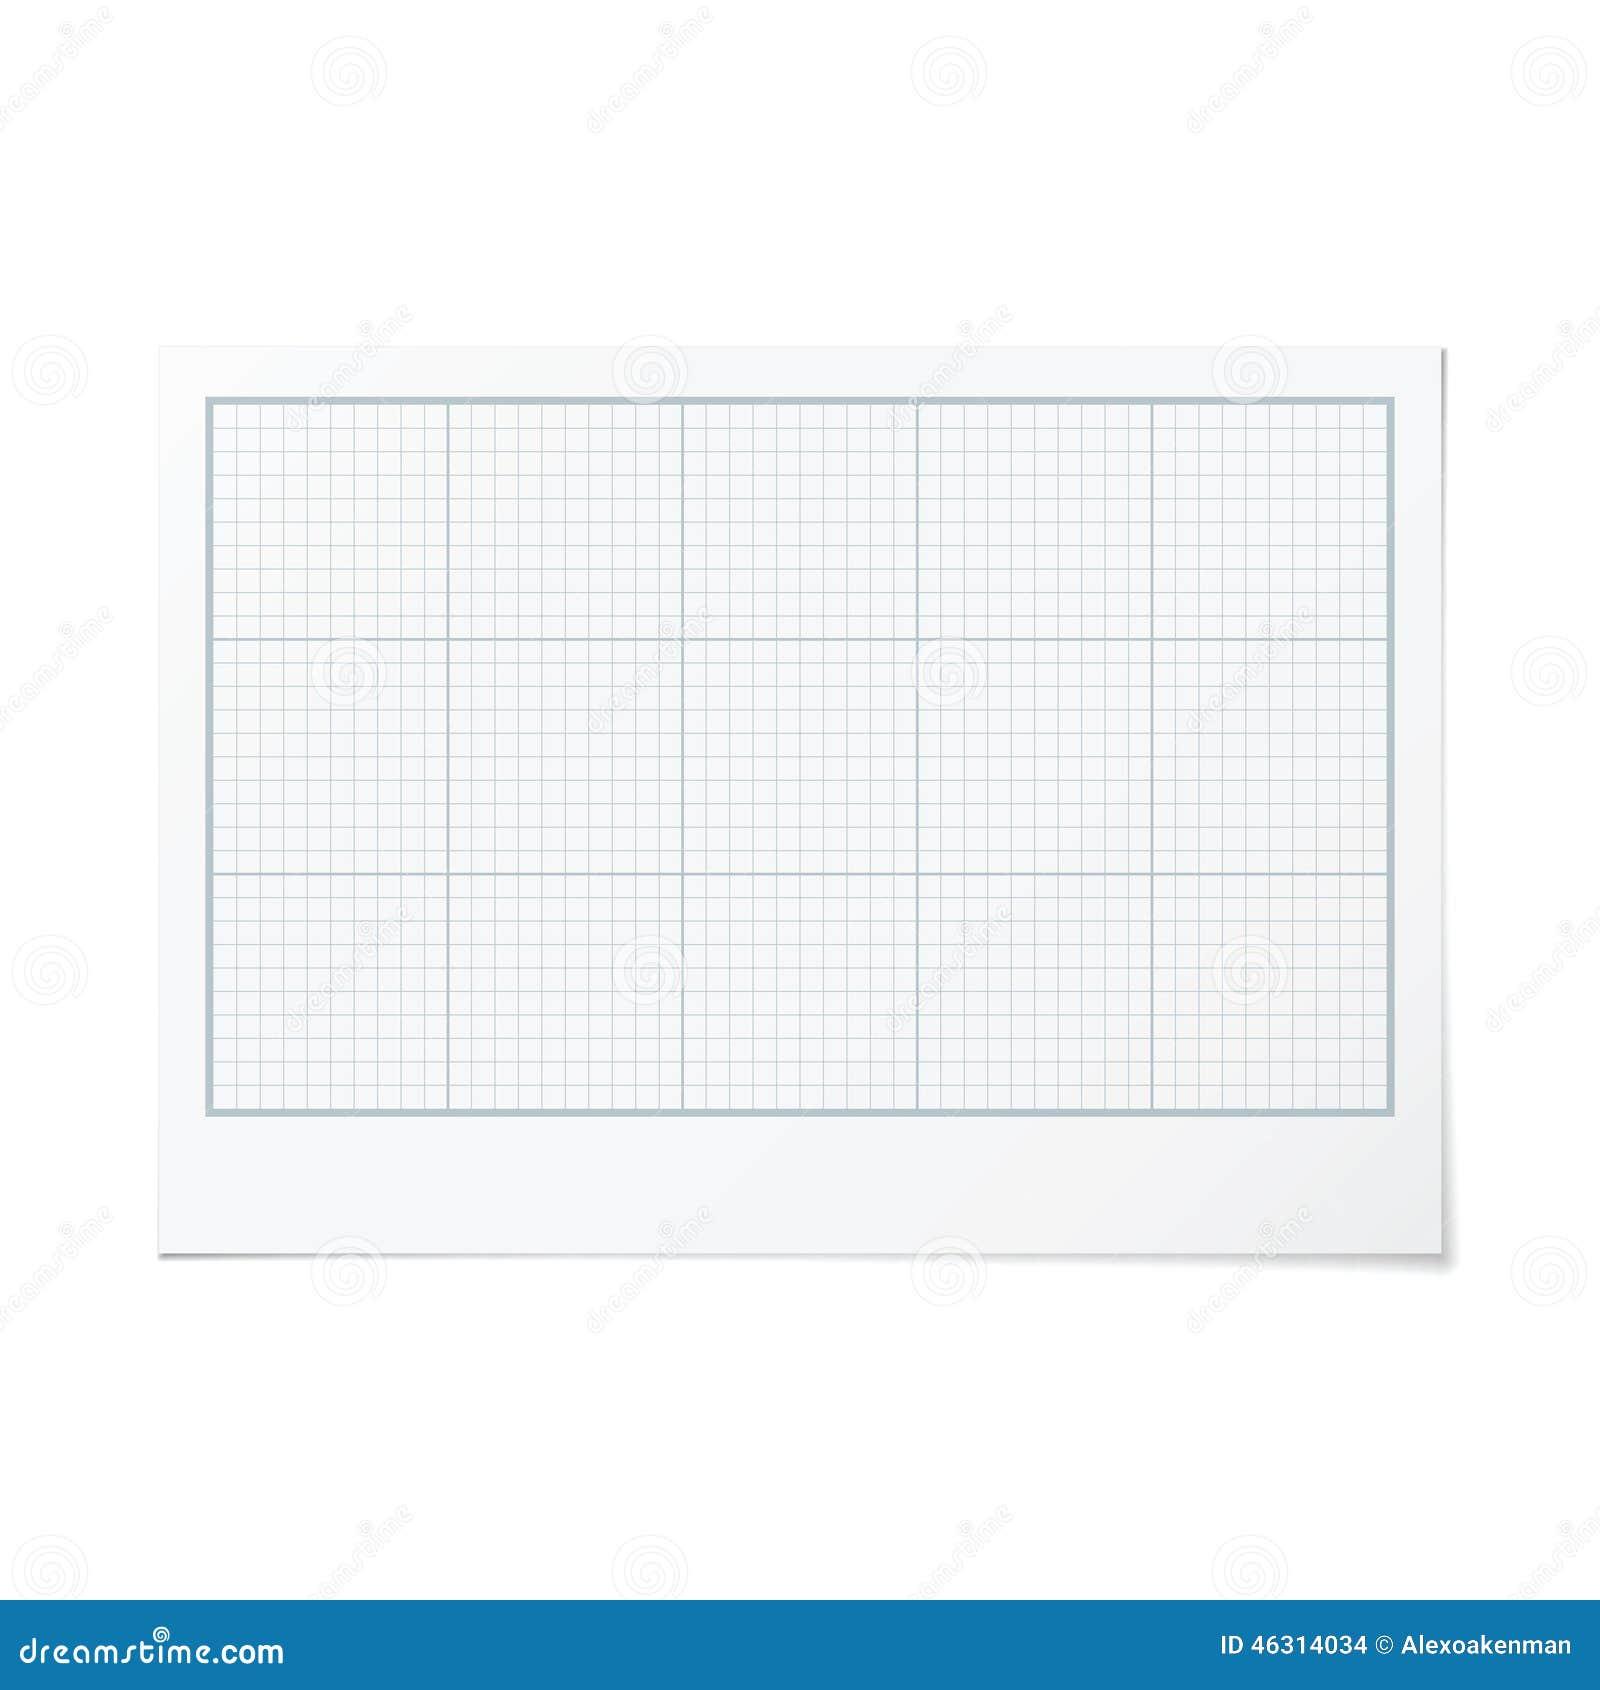 vector landscape orientation engineering graph paper stock illustration